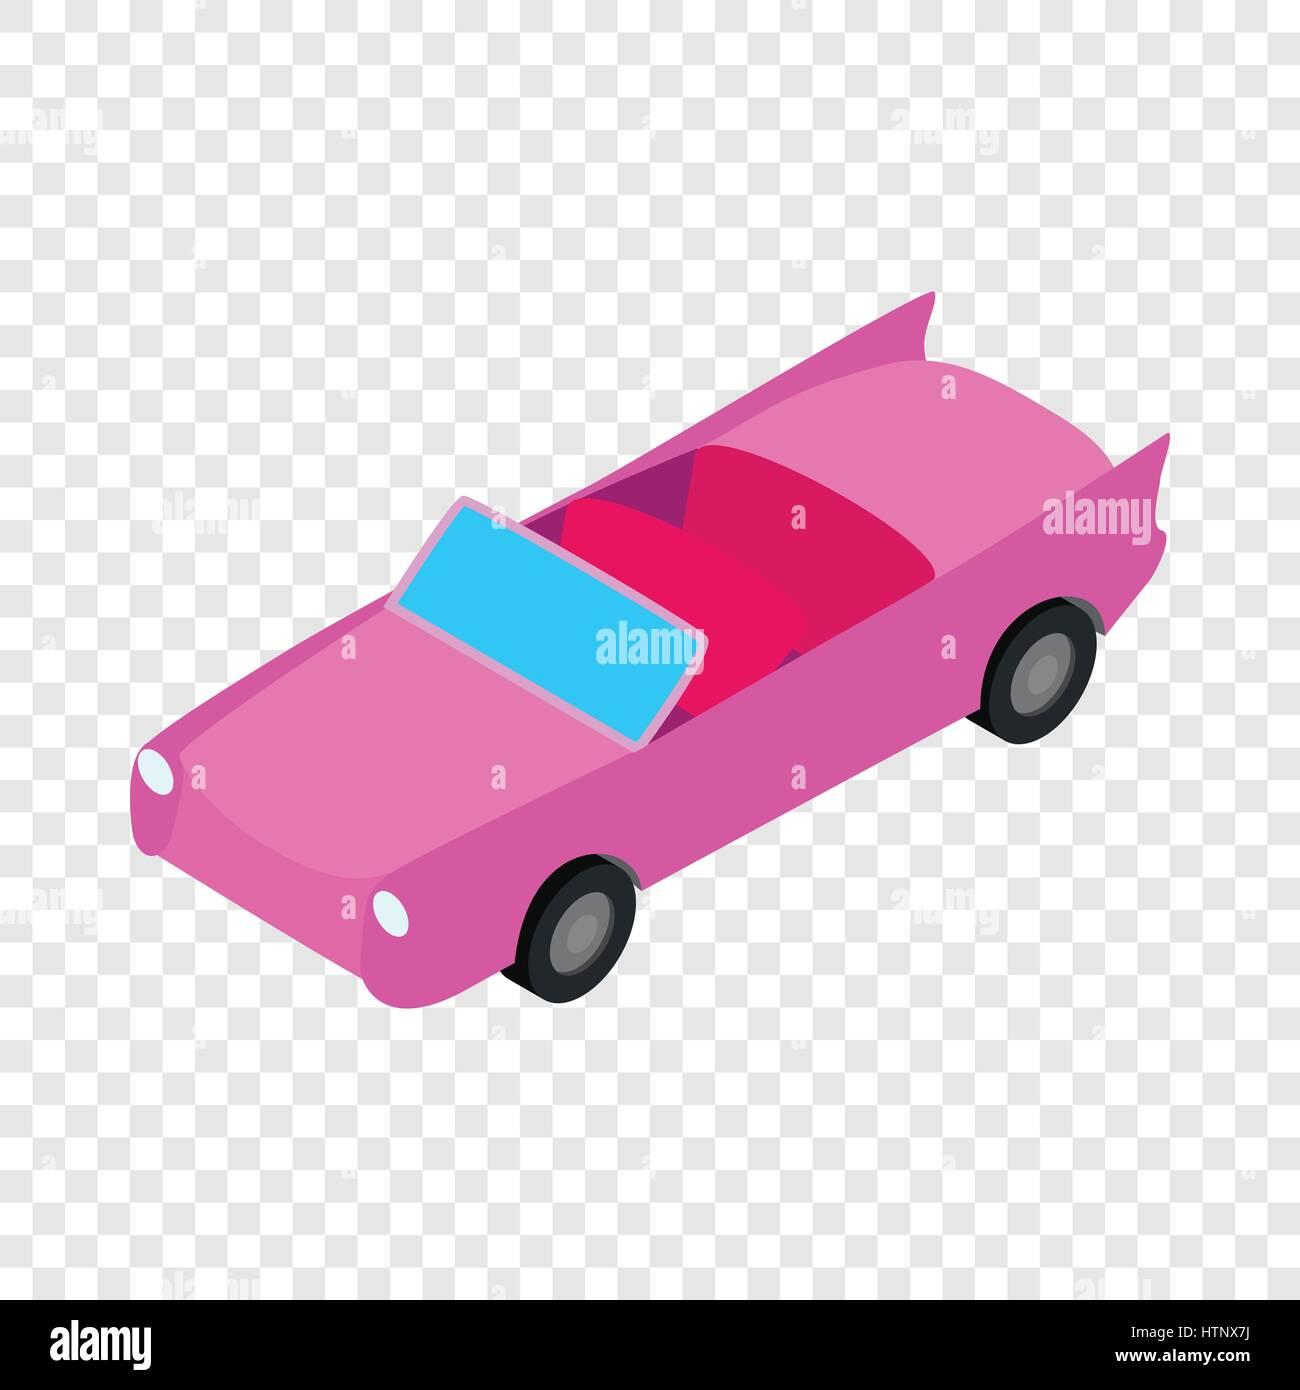 Car convertible isometric icon - Stock Image